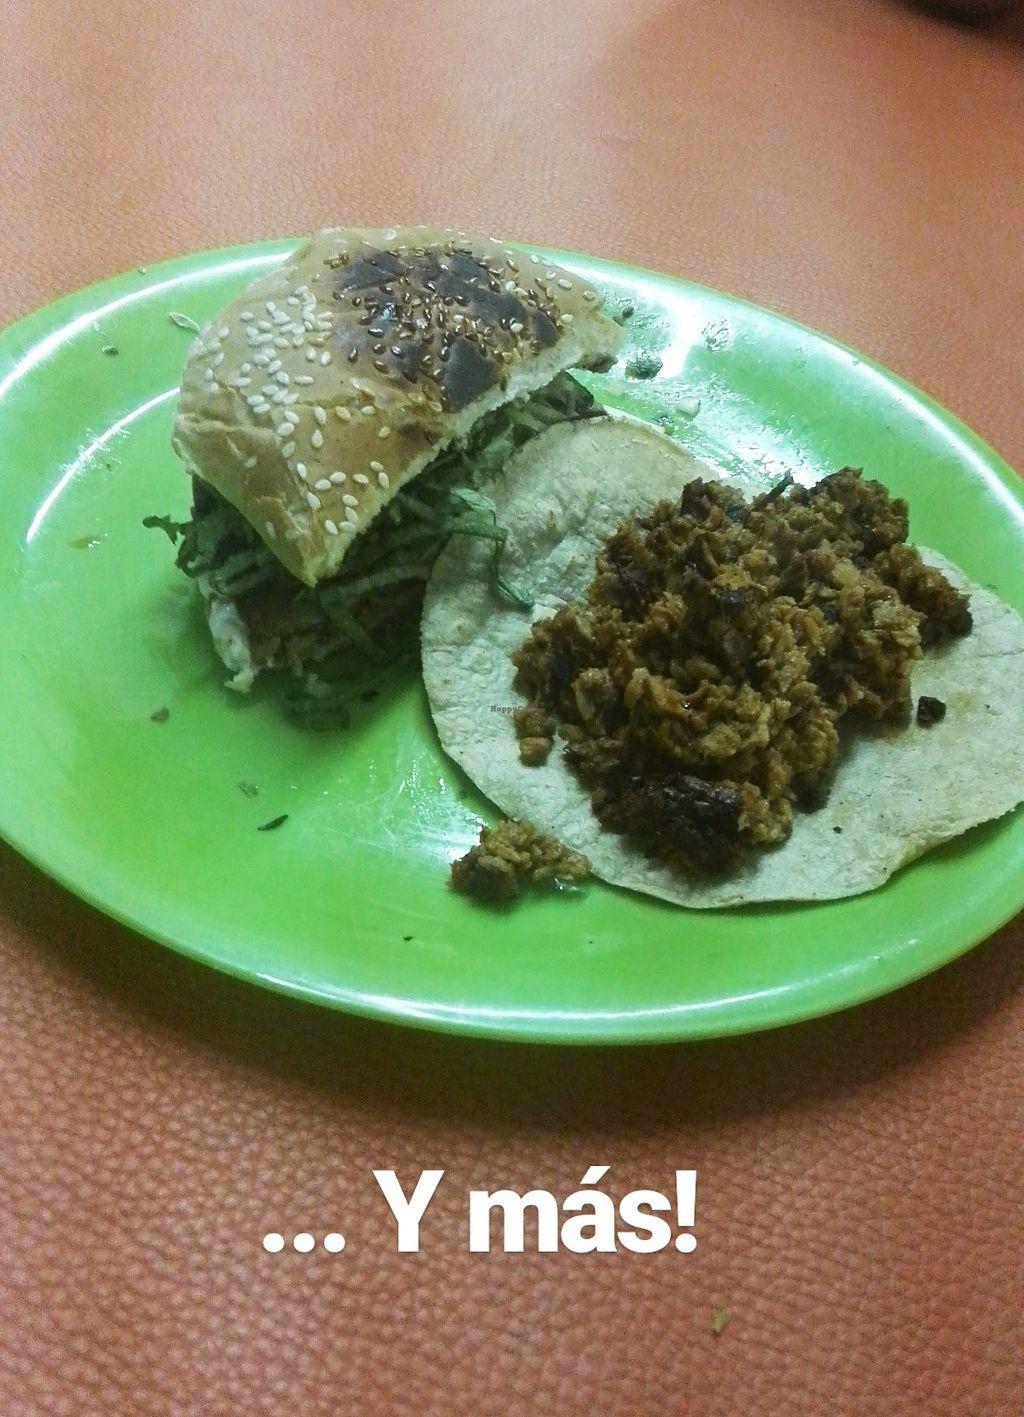 "Photo of Taco Station  by <a href=""/members/profile/Caroly"">Caroly</a> <br/>Hamburguesa y más tacos. hay de todo! <br/> March 25, 2018  - <a href='/contact/abuse/image/113356/375720'>Report</a>"